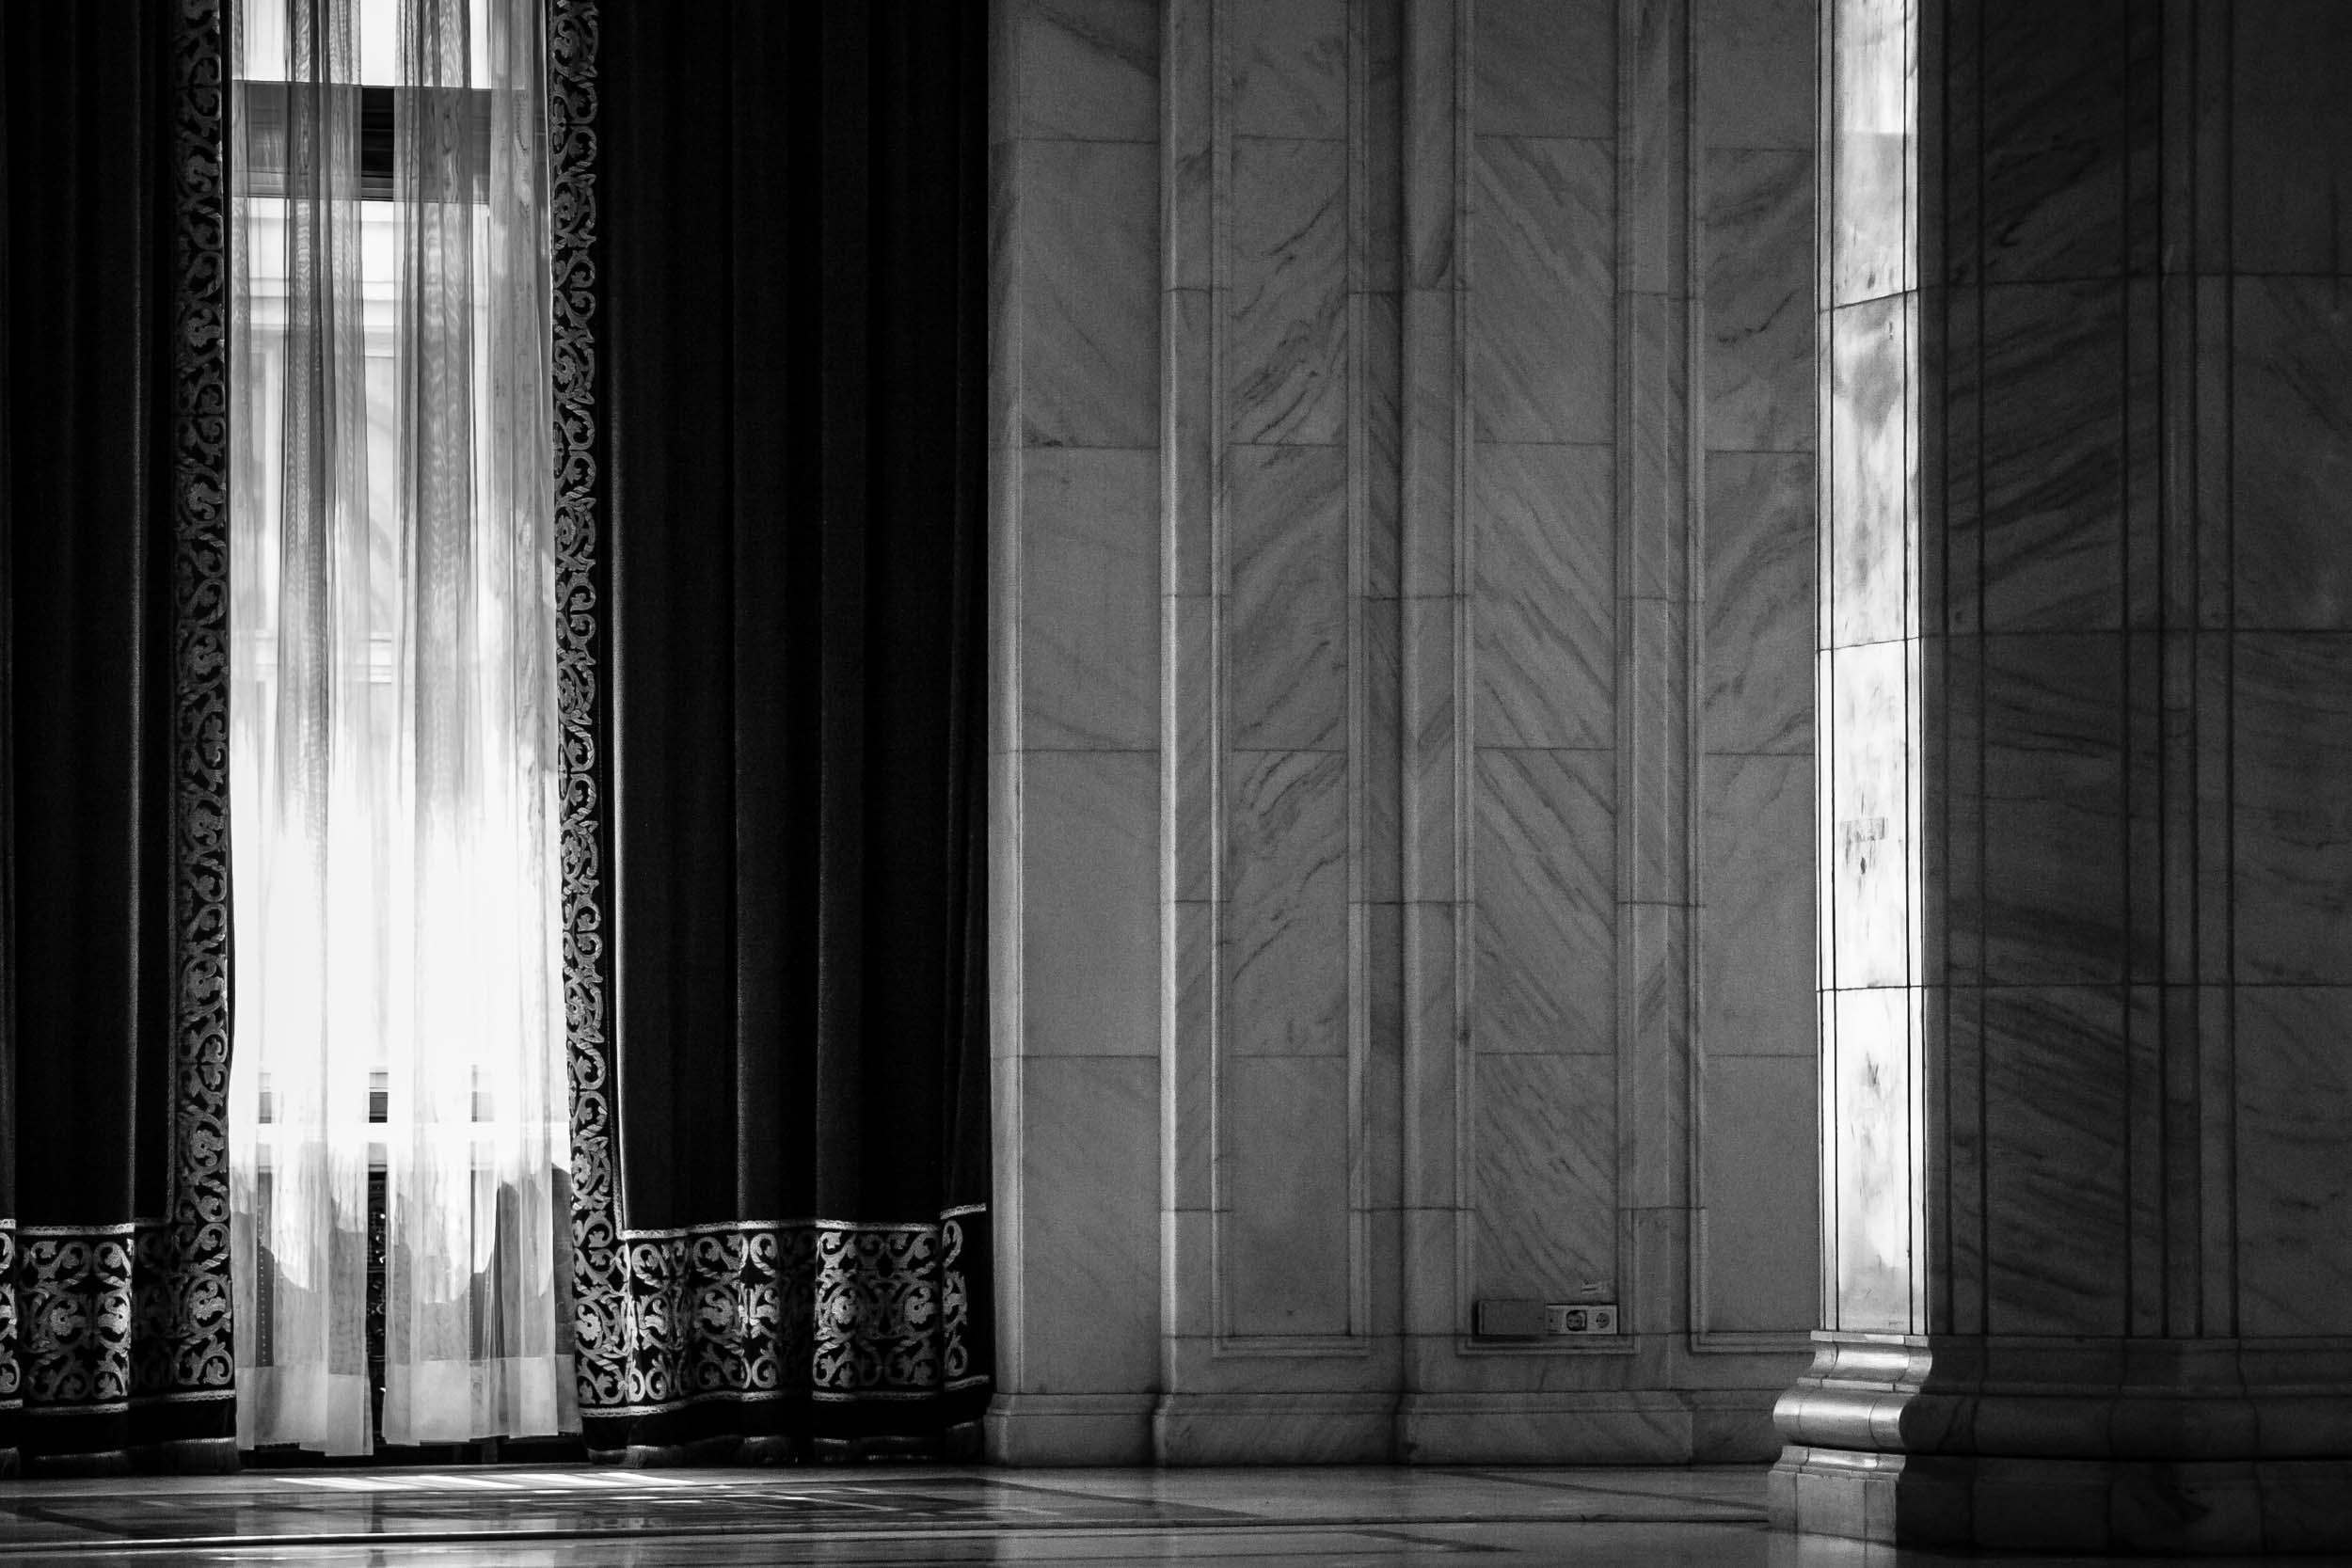 Palace of Parliament Bucharest, Romania 2009